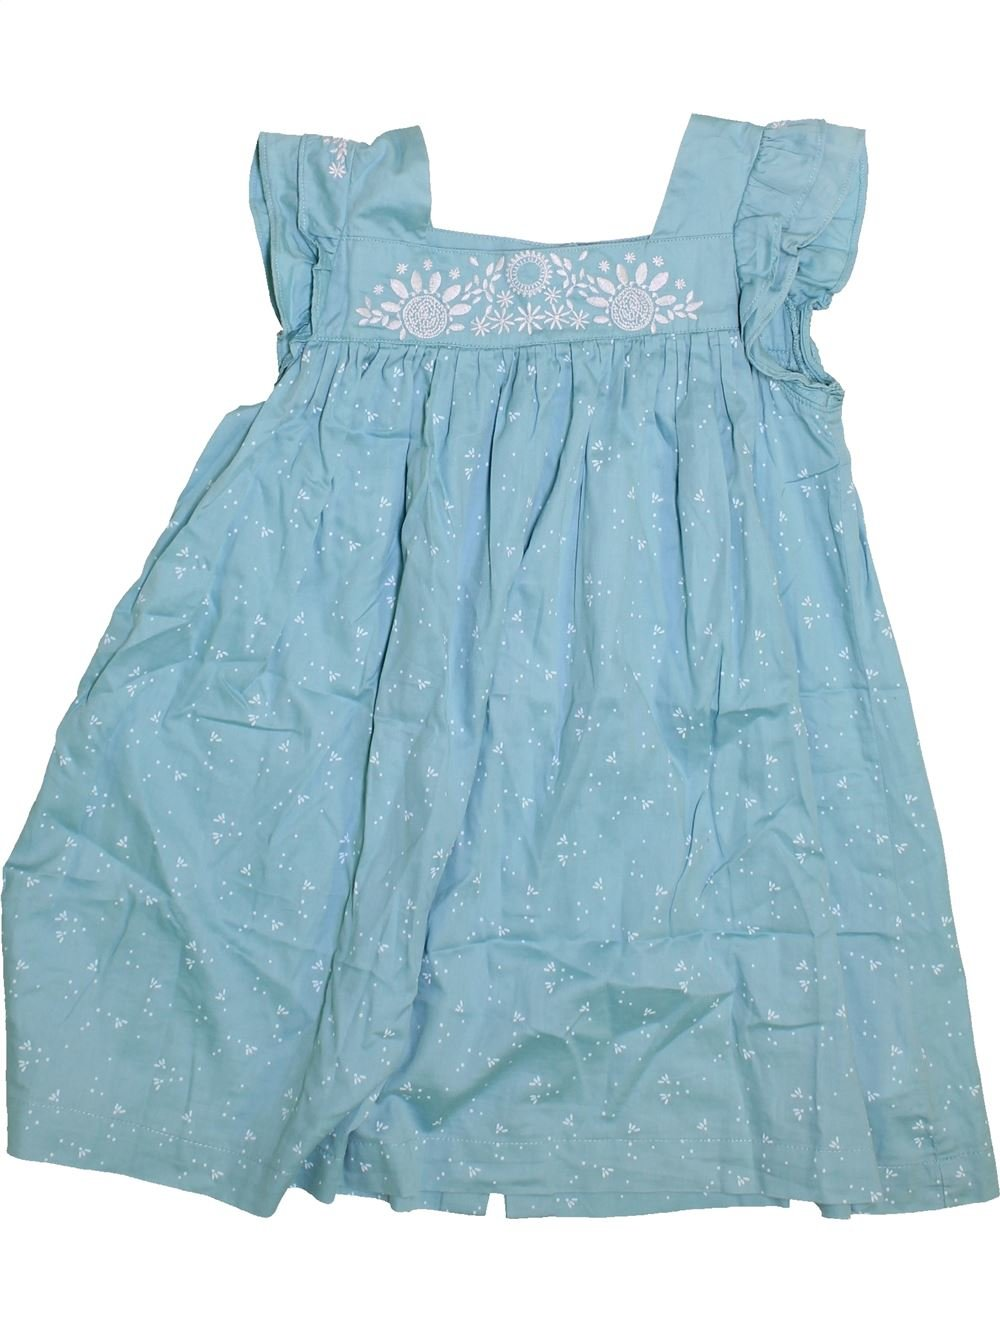 b6a63e7e28884 Robe bleu VERTBAUDET du 10 ans pour Fille - 1446491